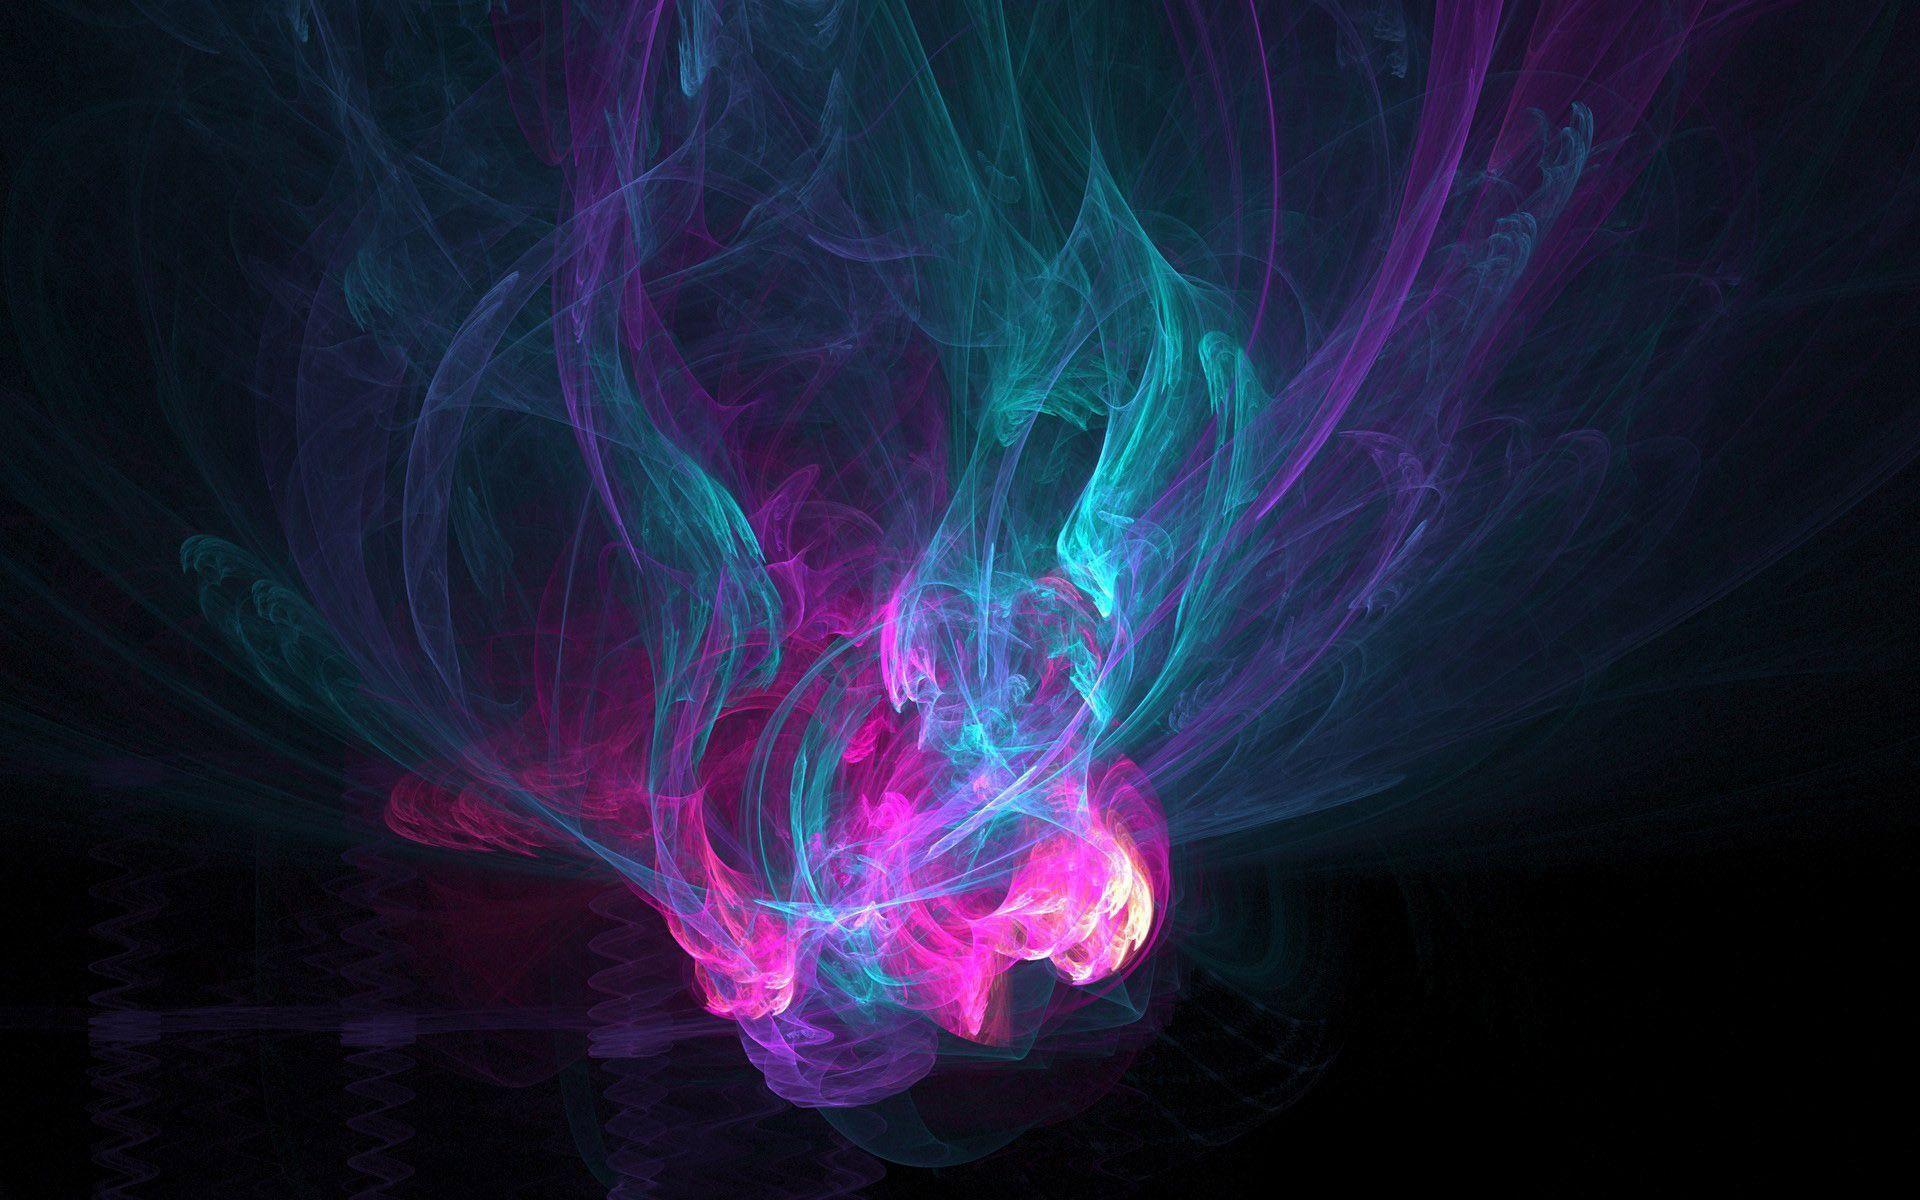 Neon Lights Backgrounds - Wallpaper Cave |Black Neon Background